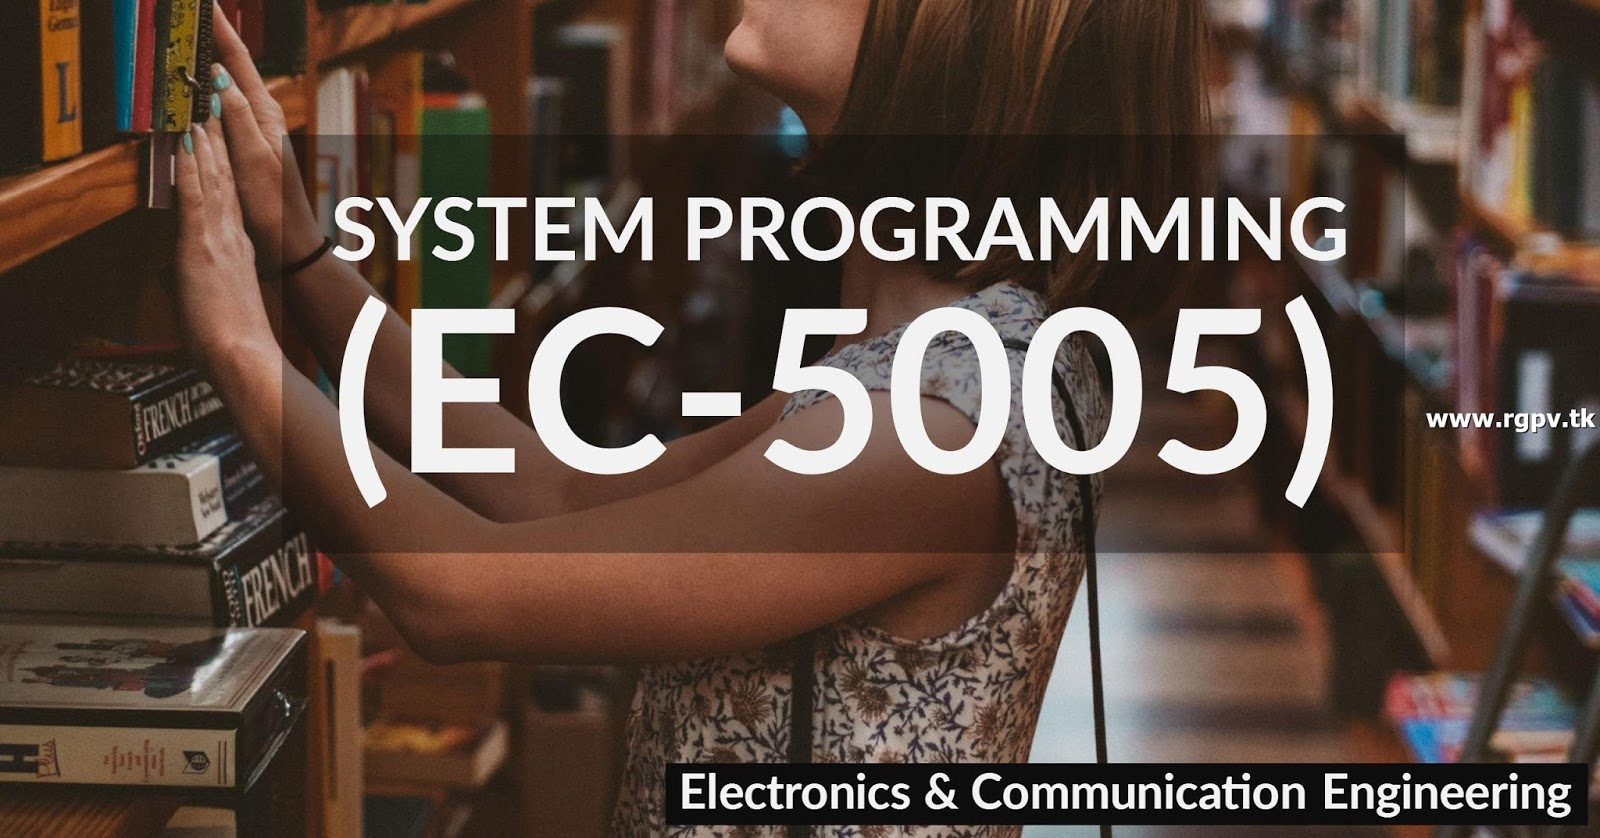 EC-5005 - System Programming RGPV notes CBGS